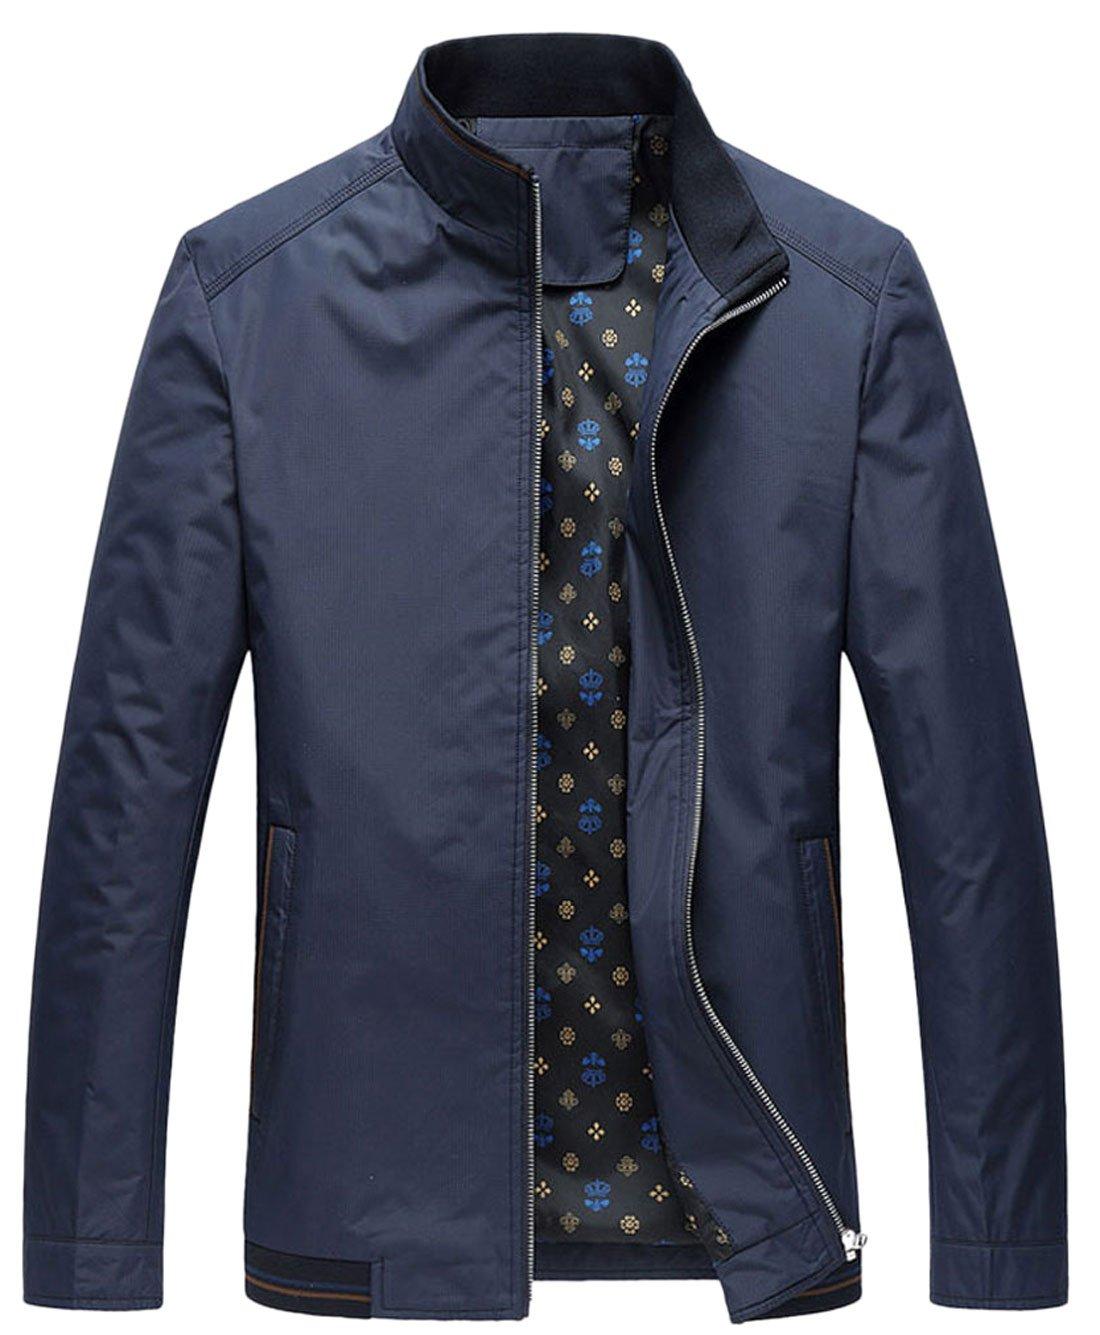 Chouyatou Mens Casual Softshell Full Zip Lightweight Bomber Jacket (Medium, Dark Blue) by Chouyatou